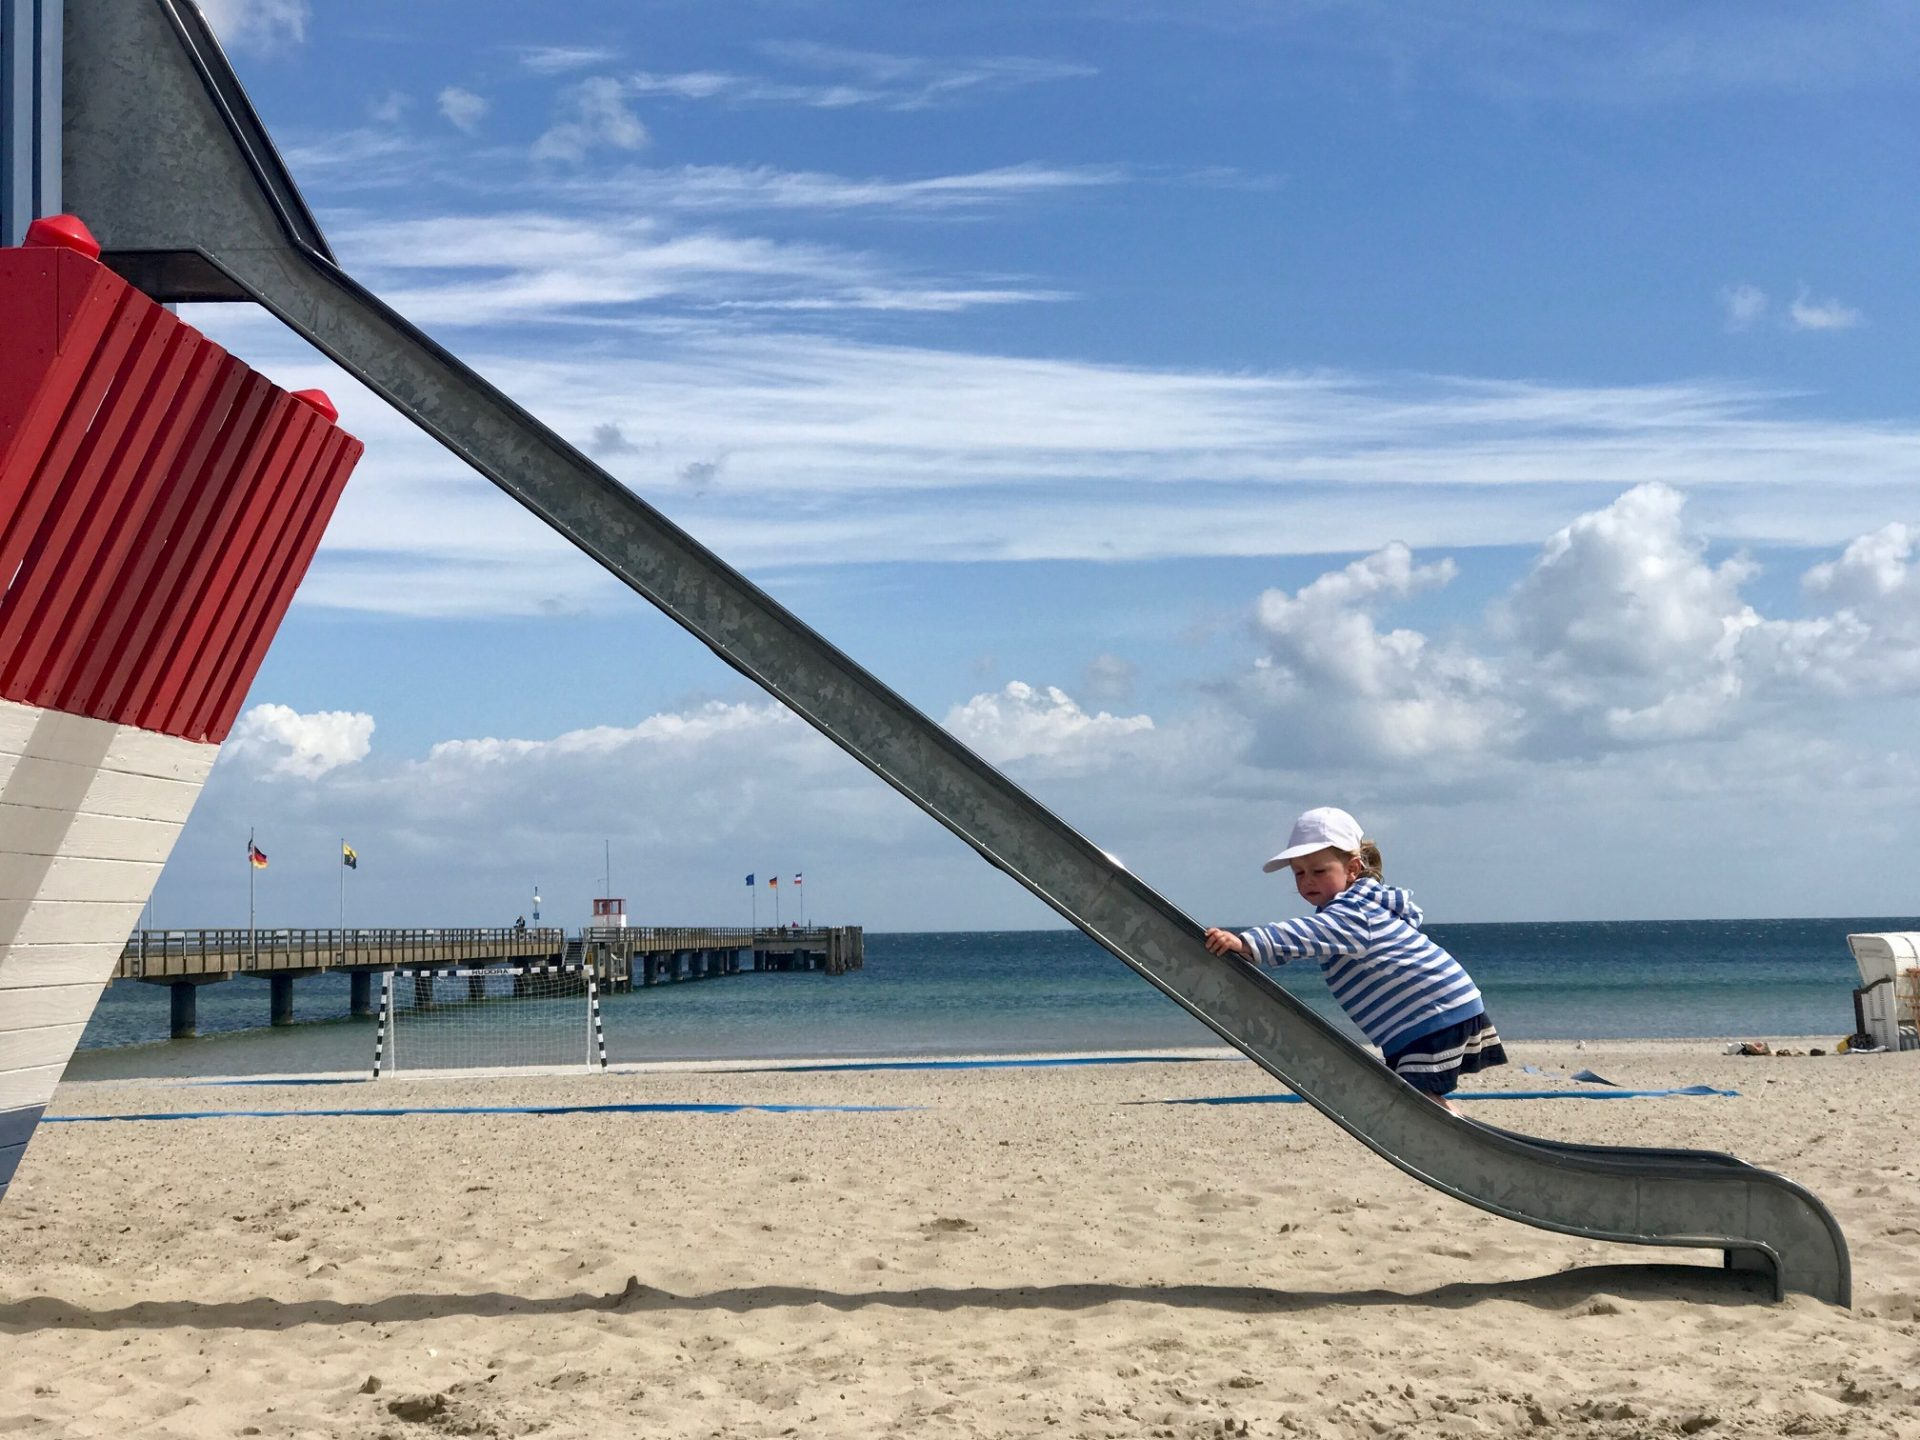 Ferien am Meer – Merlin ist begeistert